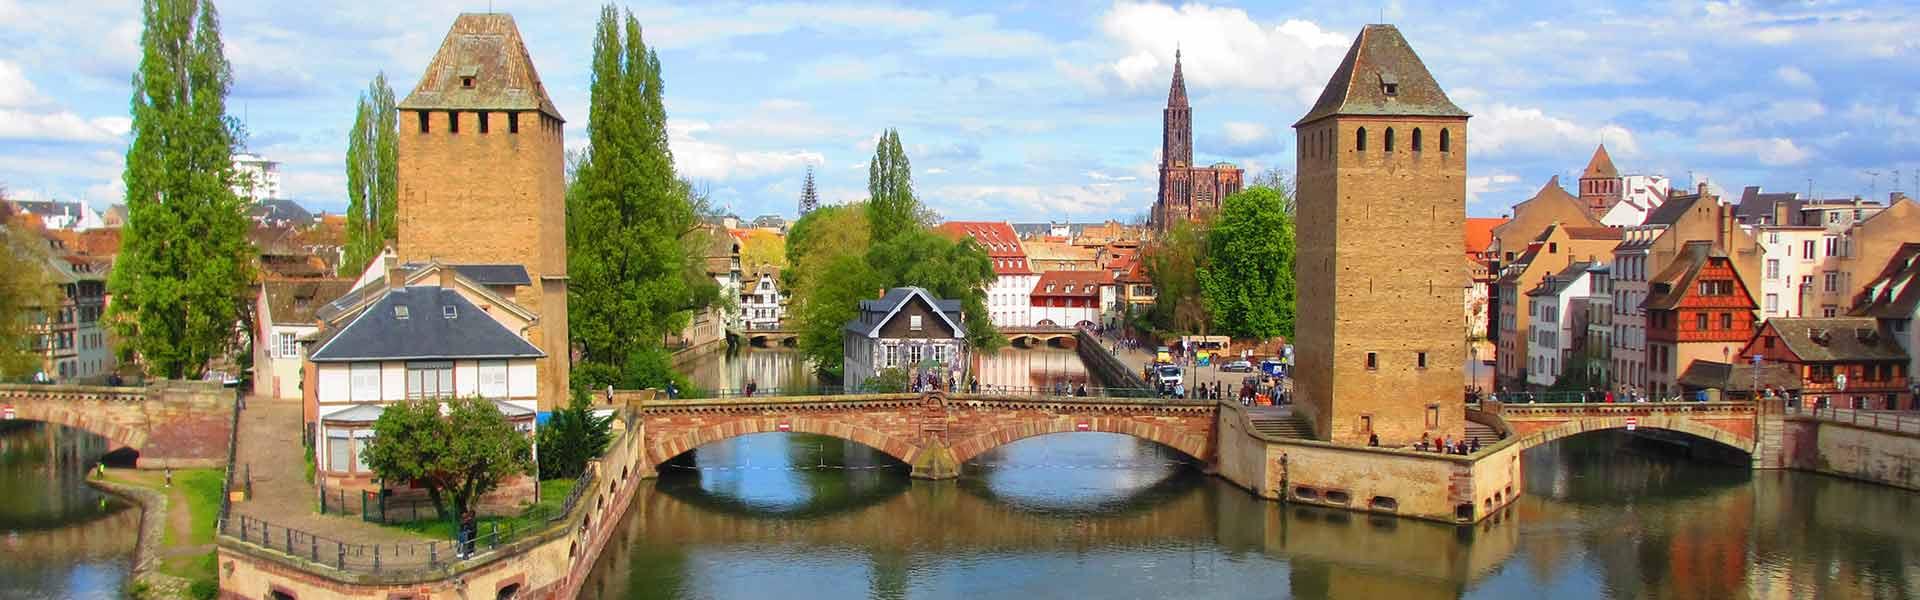 City of Strasbourg near Epinal in Lorraine, France